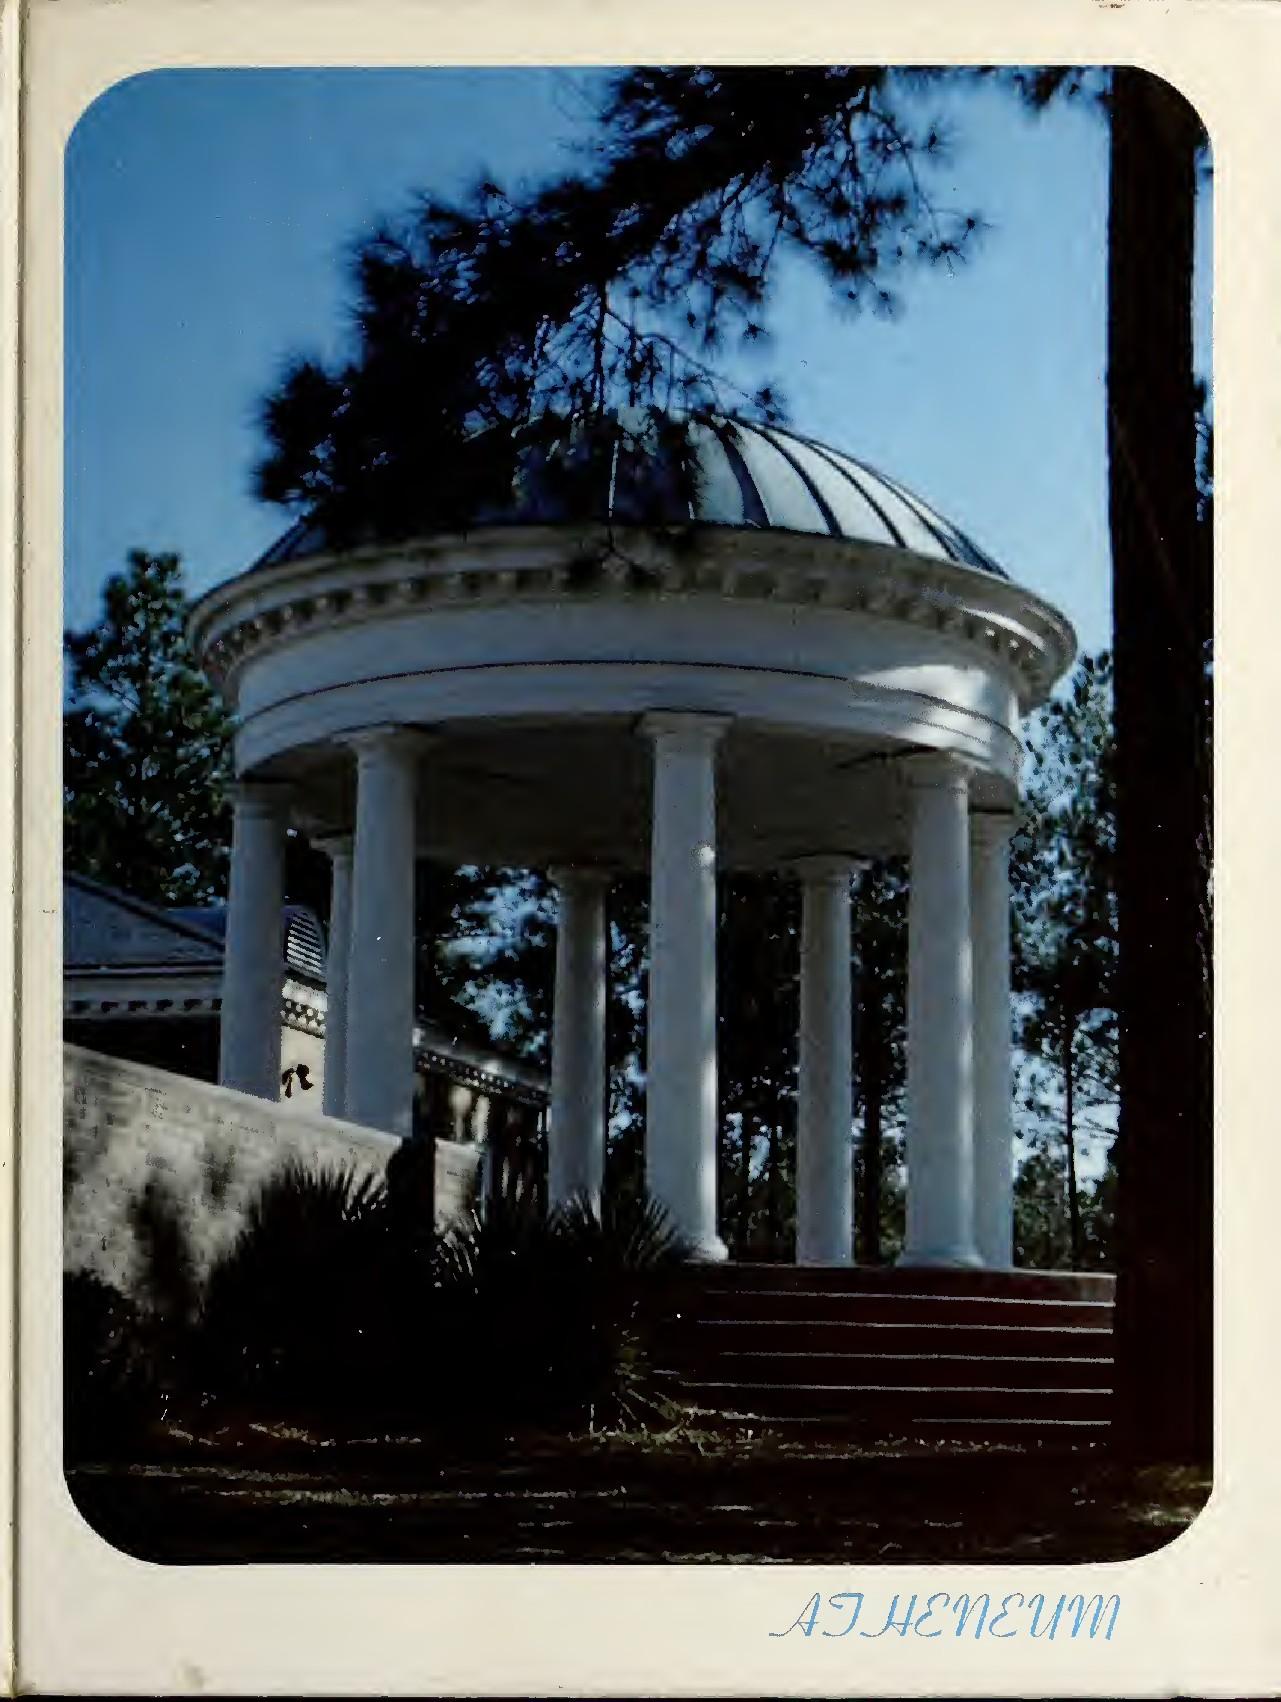 Atheneum, 1981-1982